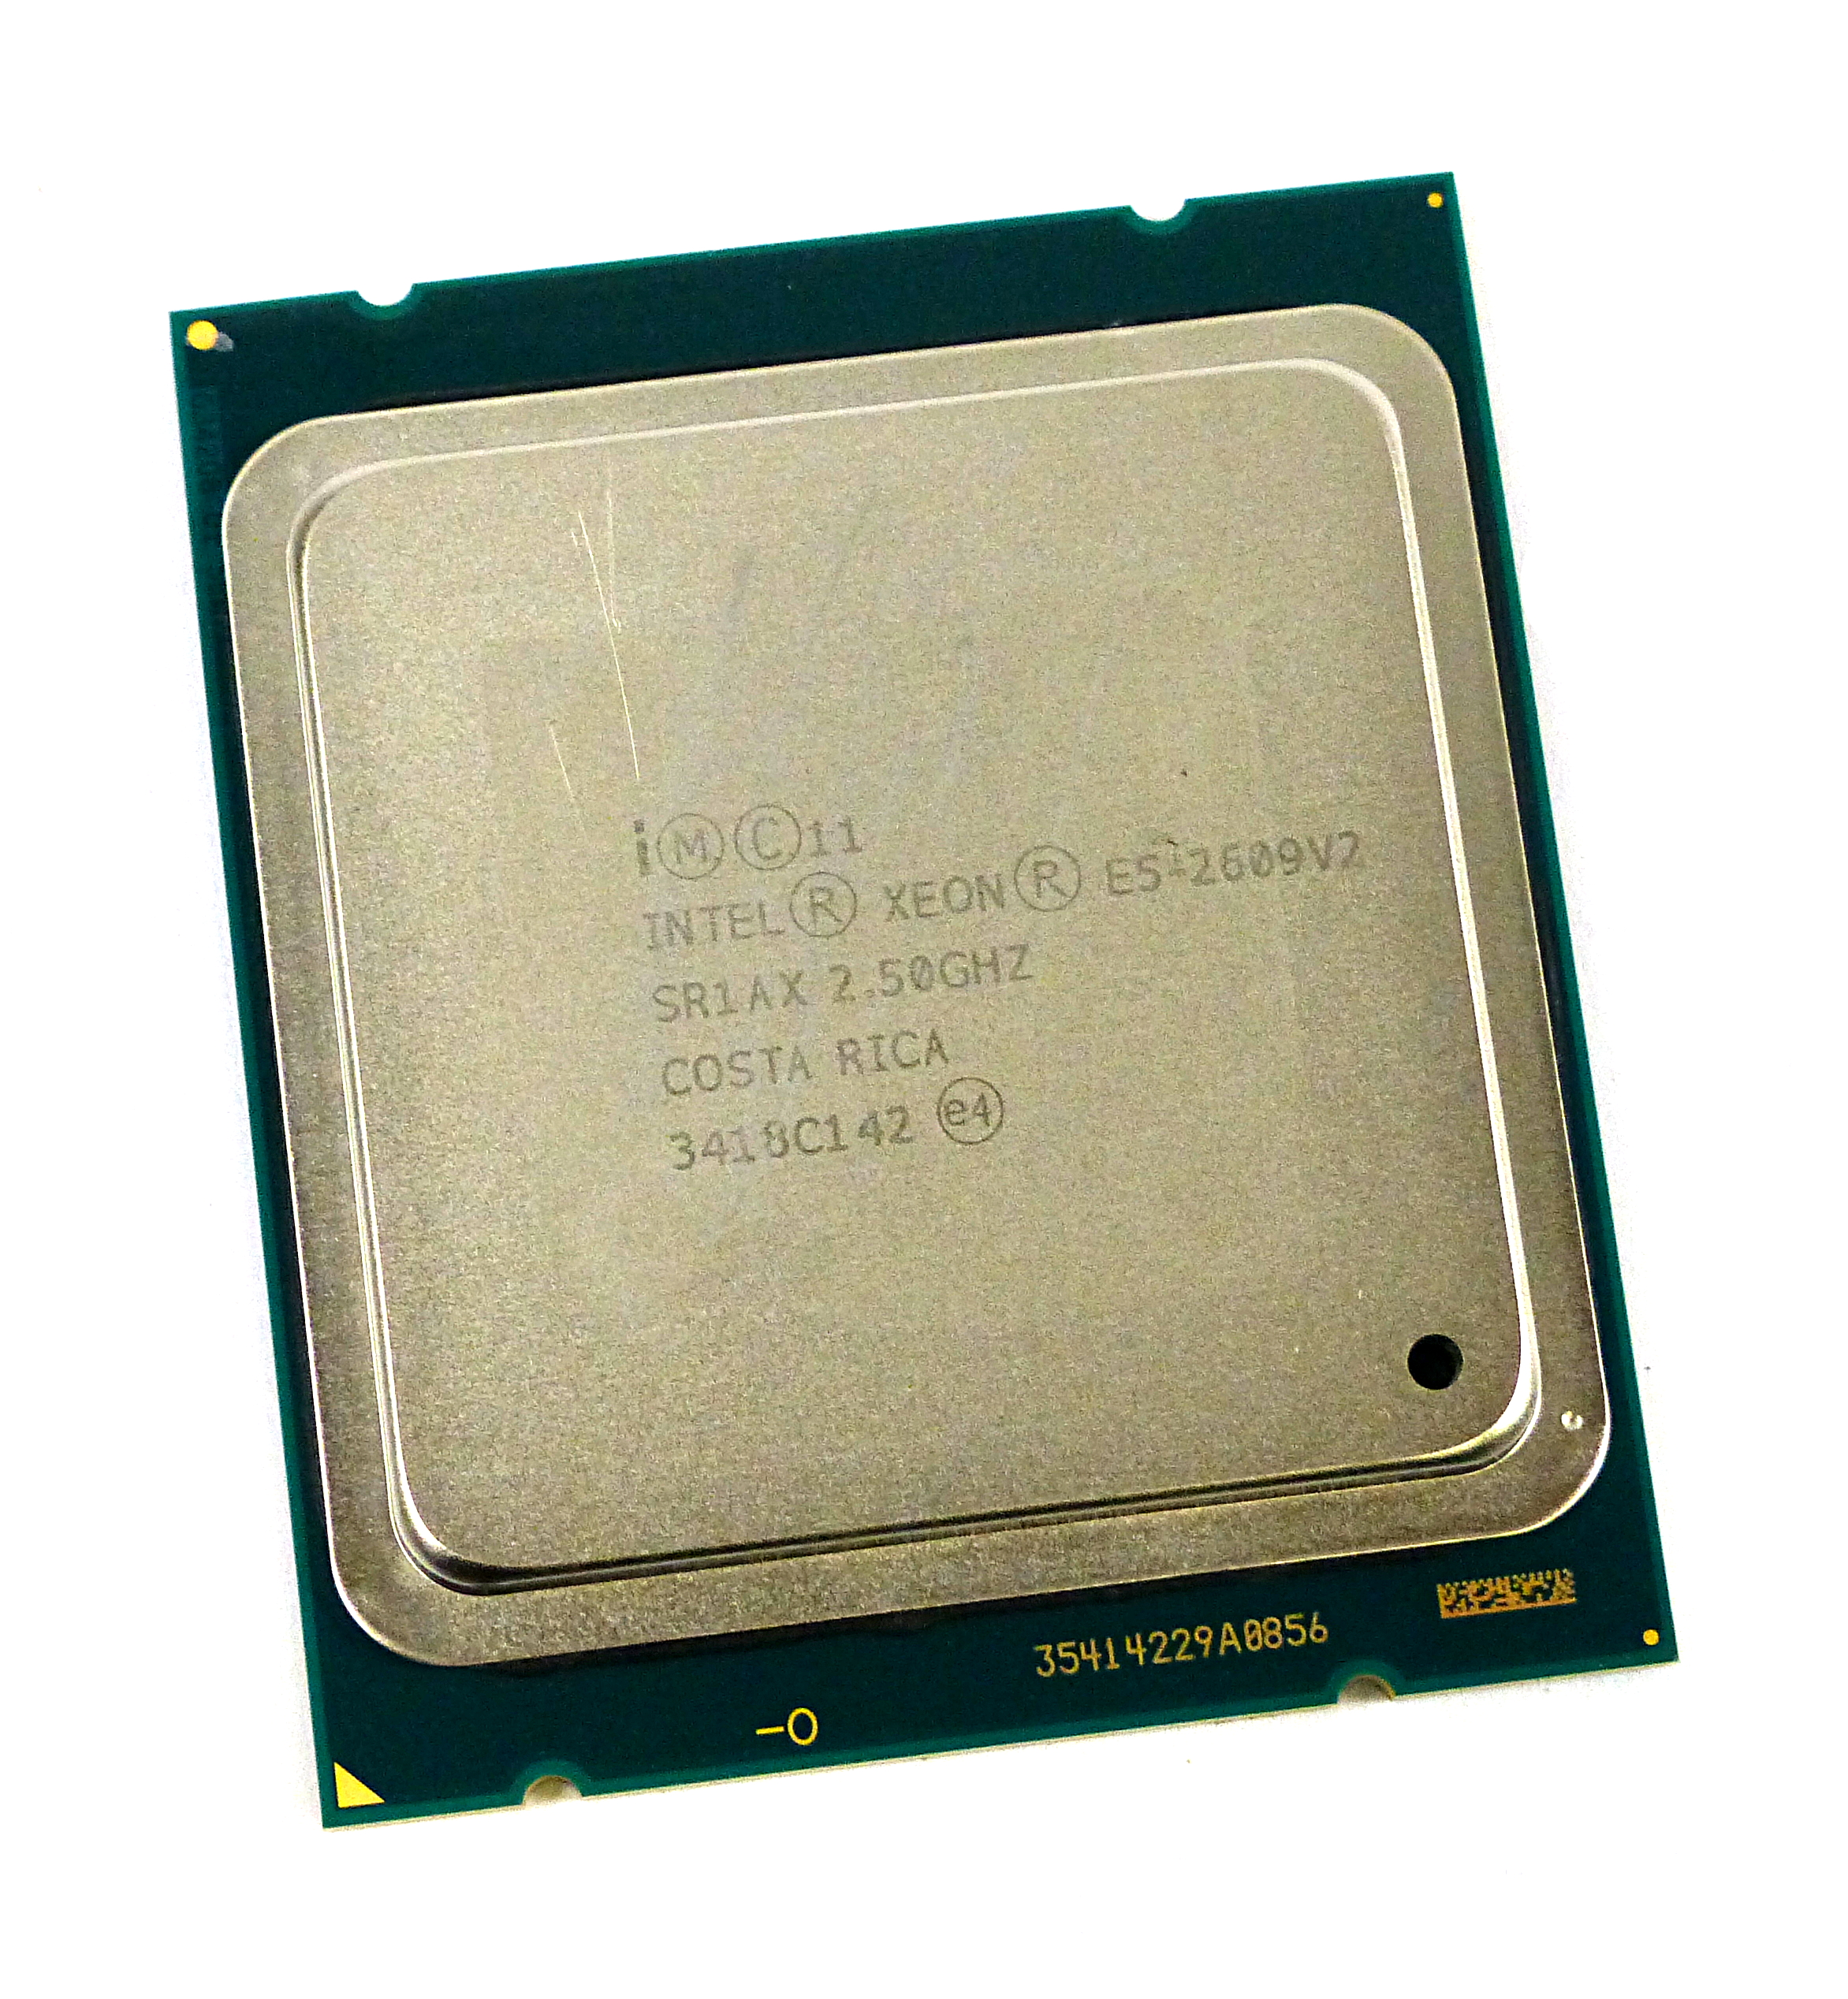 Intel Xeon E5-2609 v2 SR1AX Quad Core 2.5GHz 10MB Socket 2011 Ivy Bridge-EP CPU